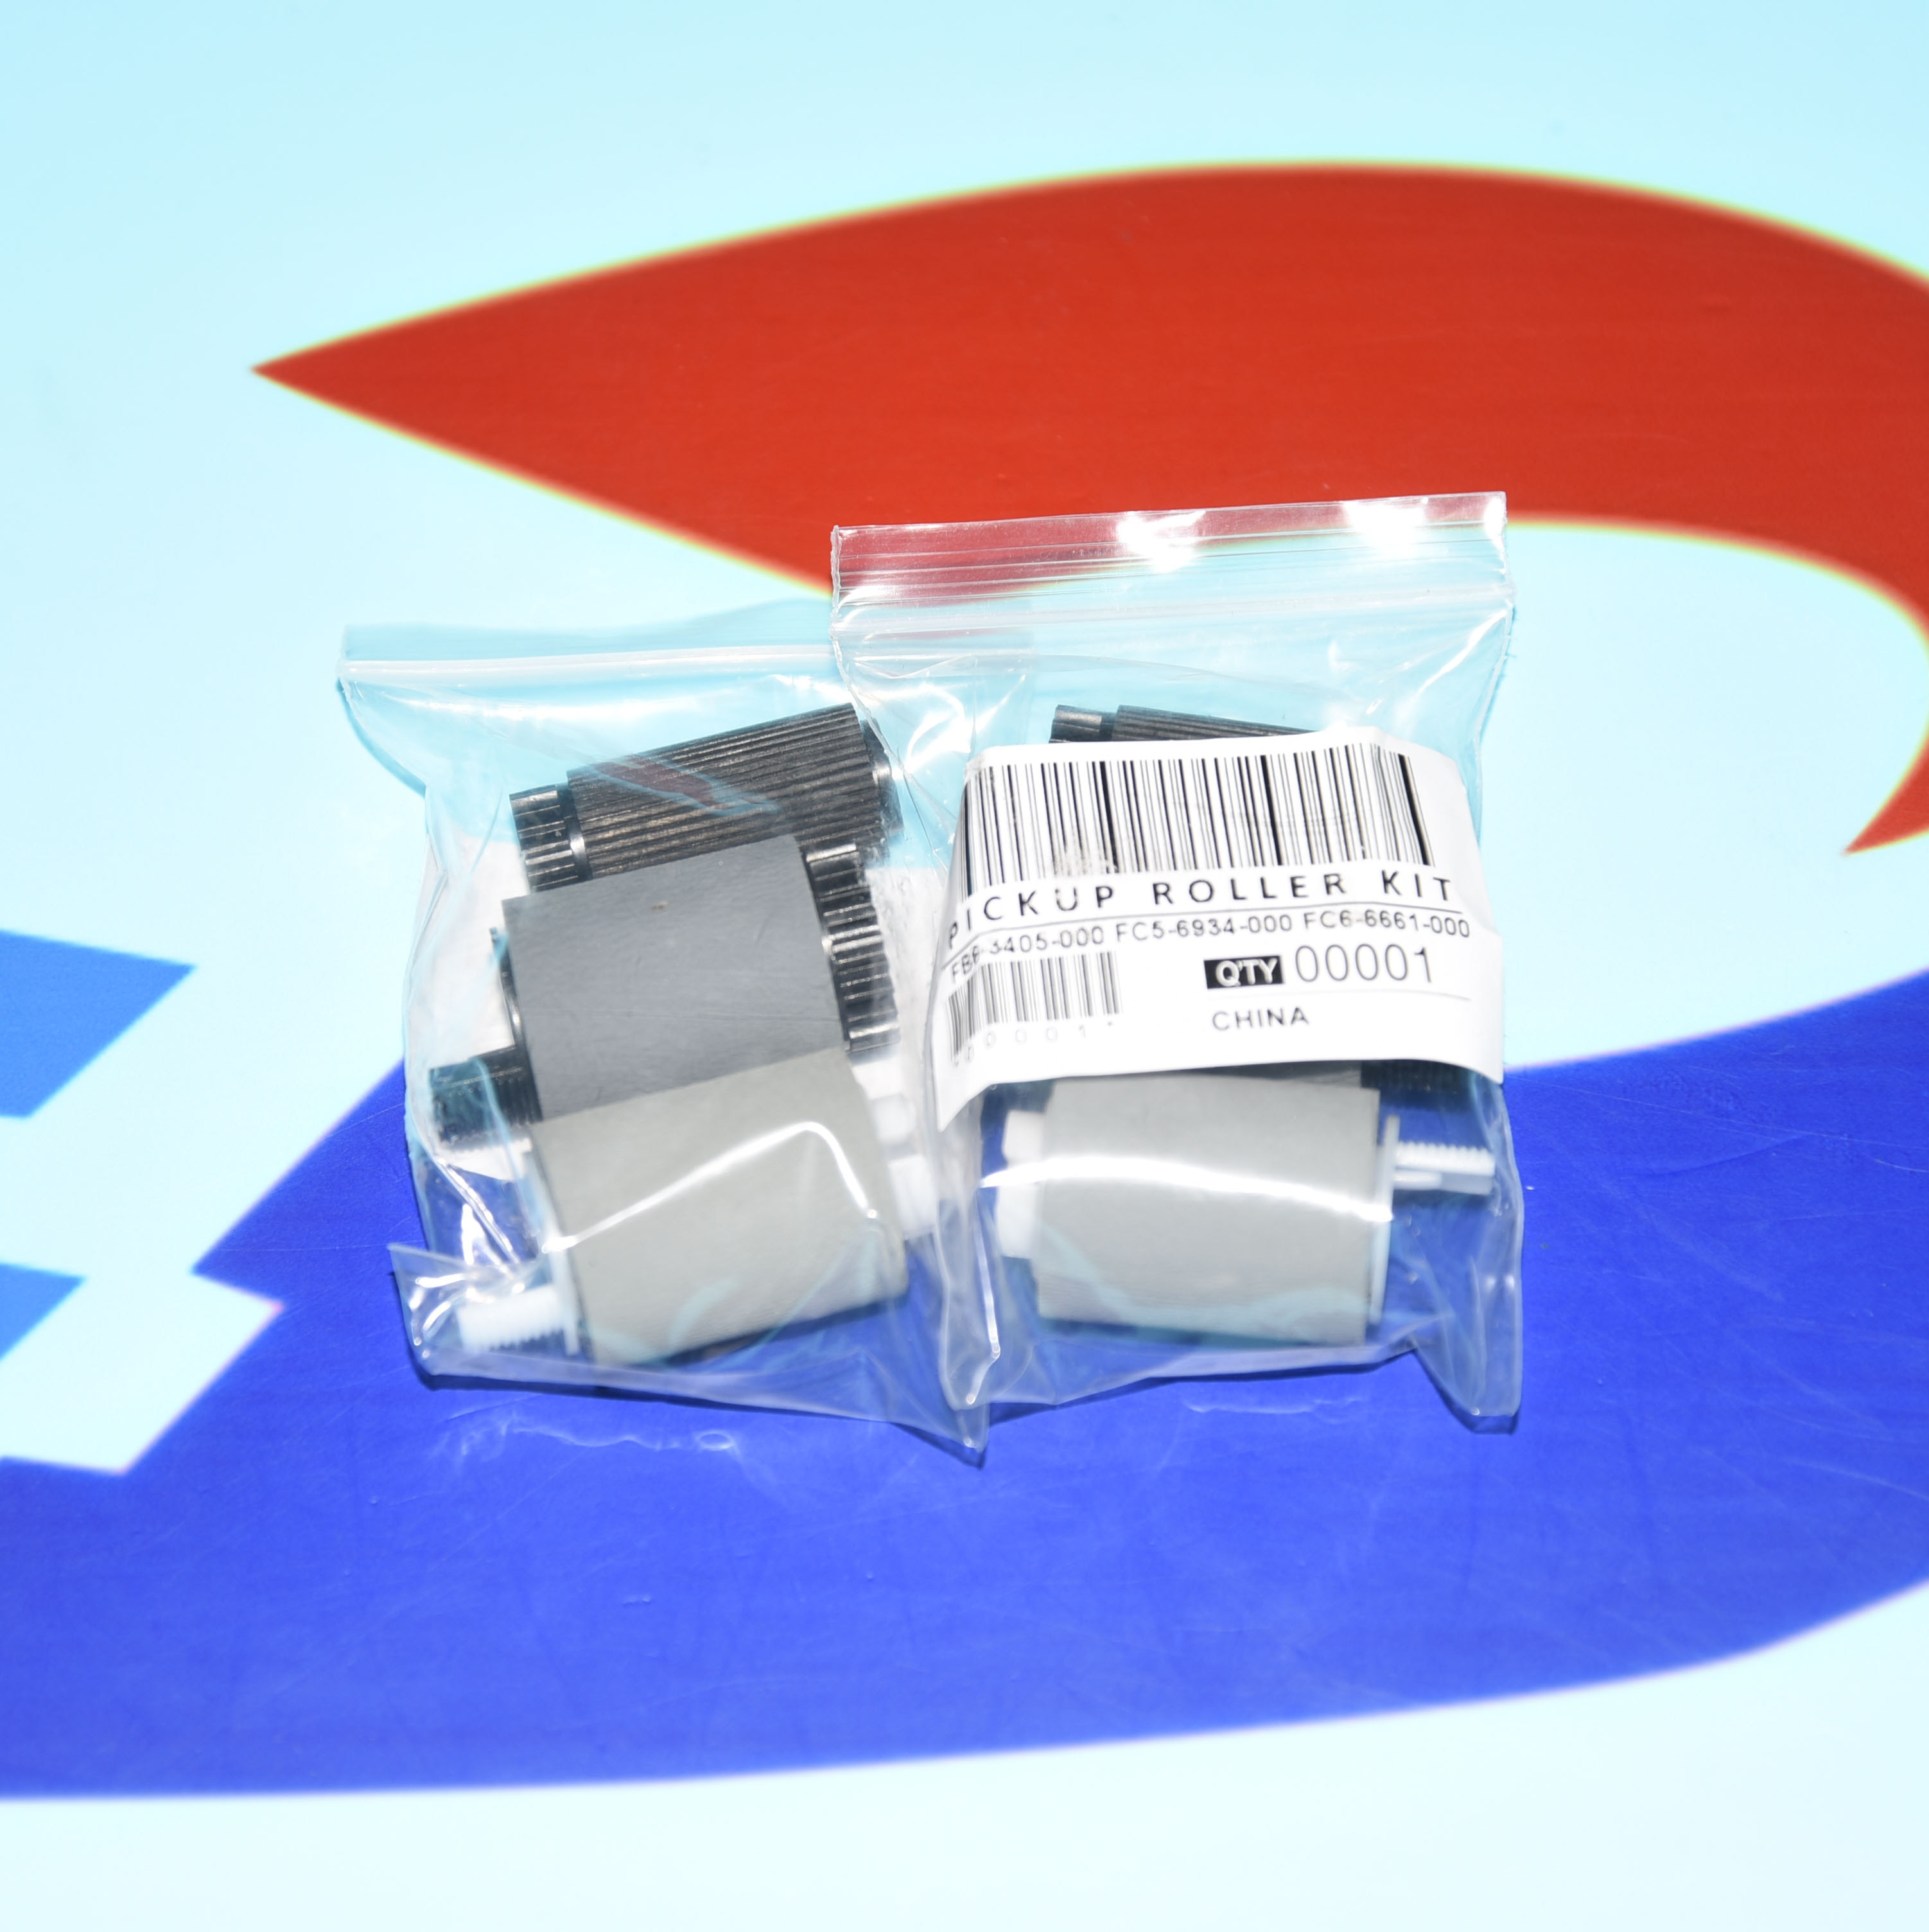 2 комплекта FC5-6934-000 FB6-3405-000 для Canon iR2270 iR2870 iR3570 iR4570 iR2520 2525 2530 2535 2545 рулон бумаги